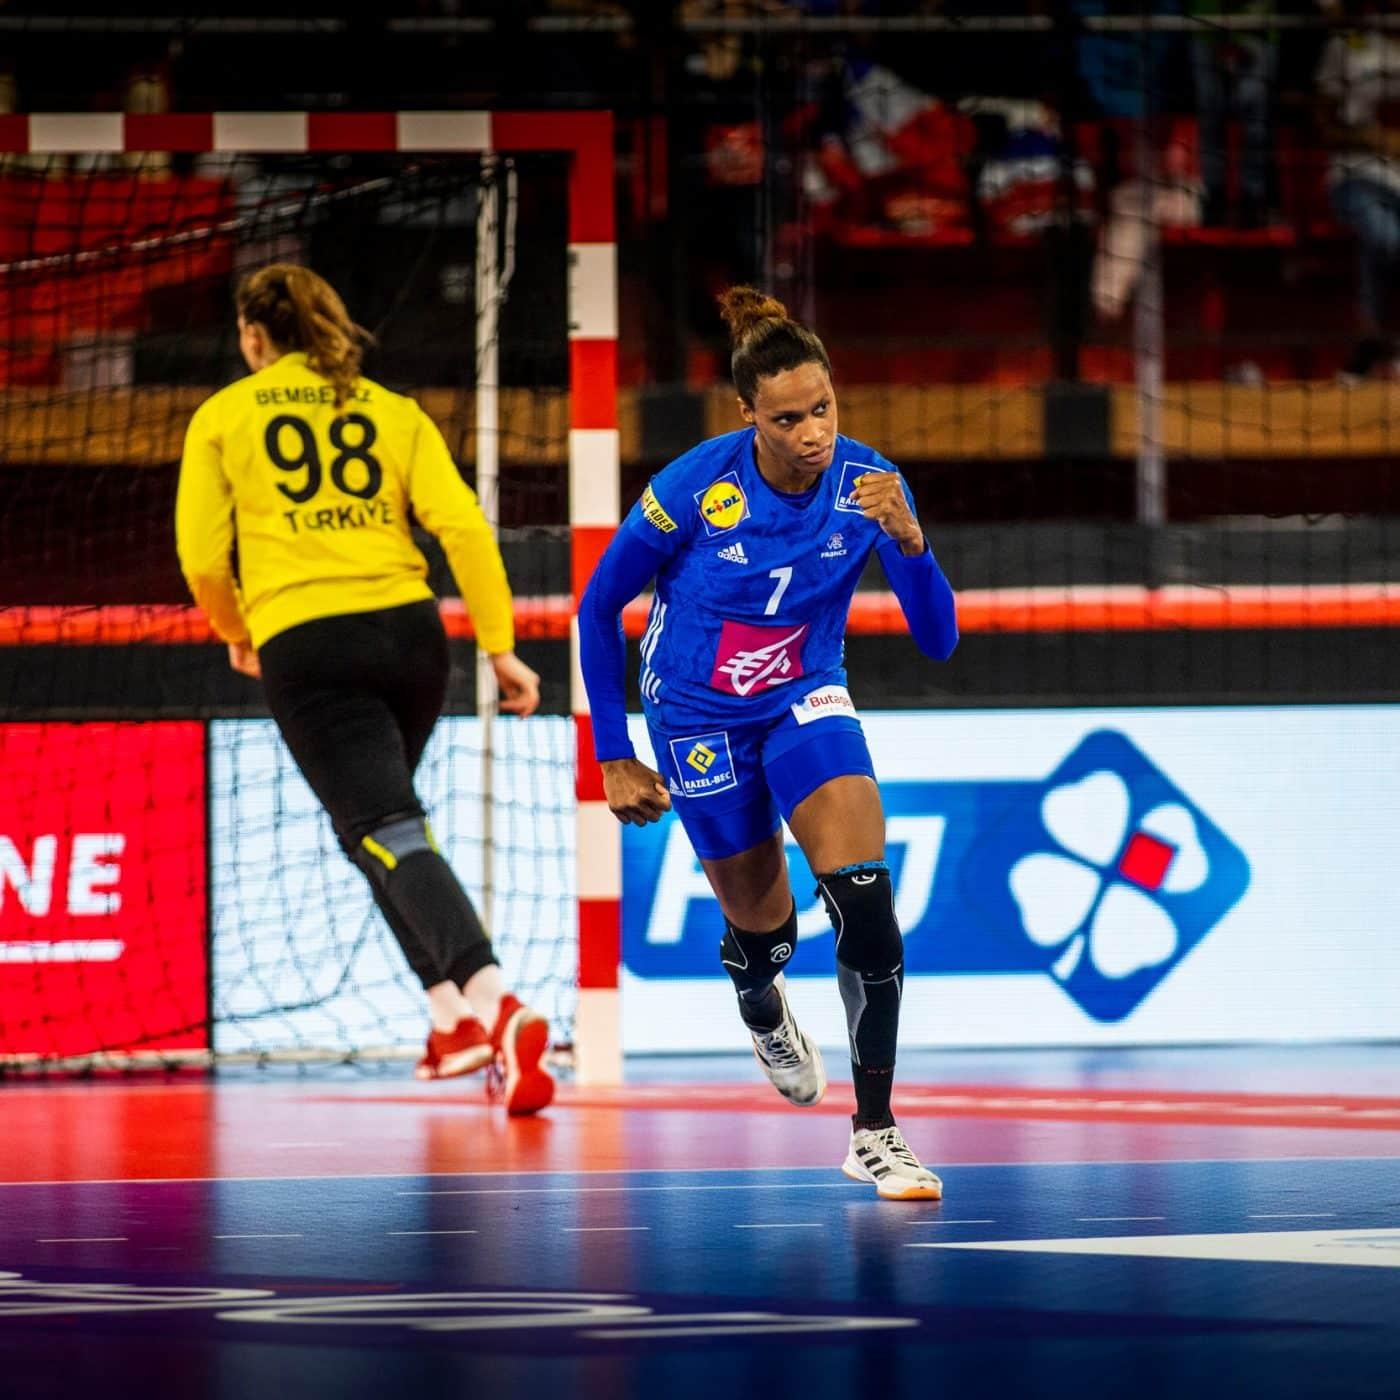 octobre-rose-équipe-de-france-handball-2019-caisse-d-epargne-4